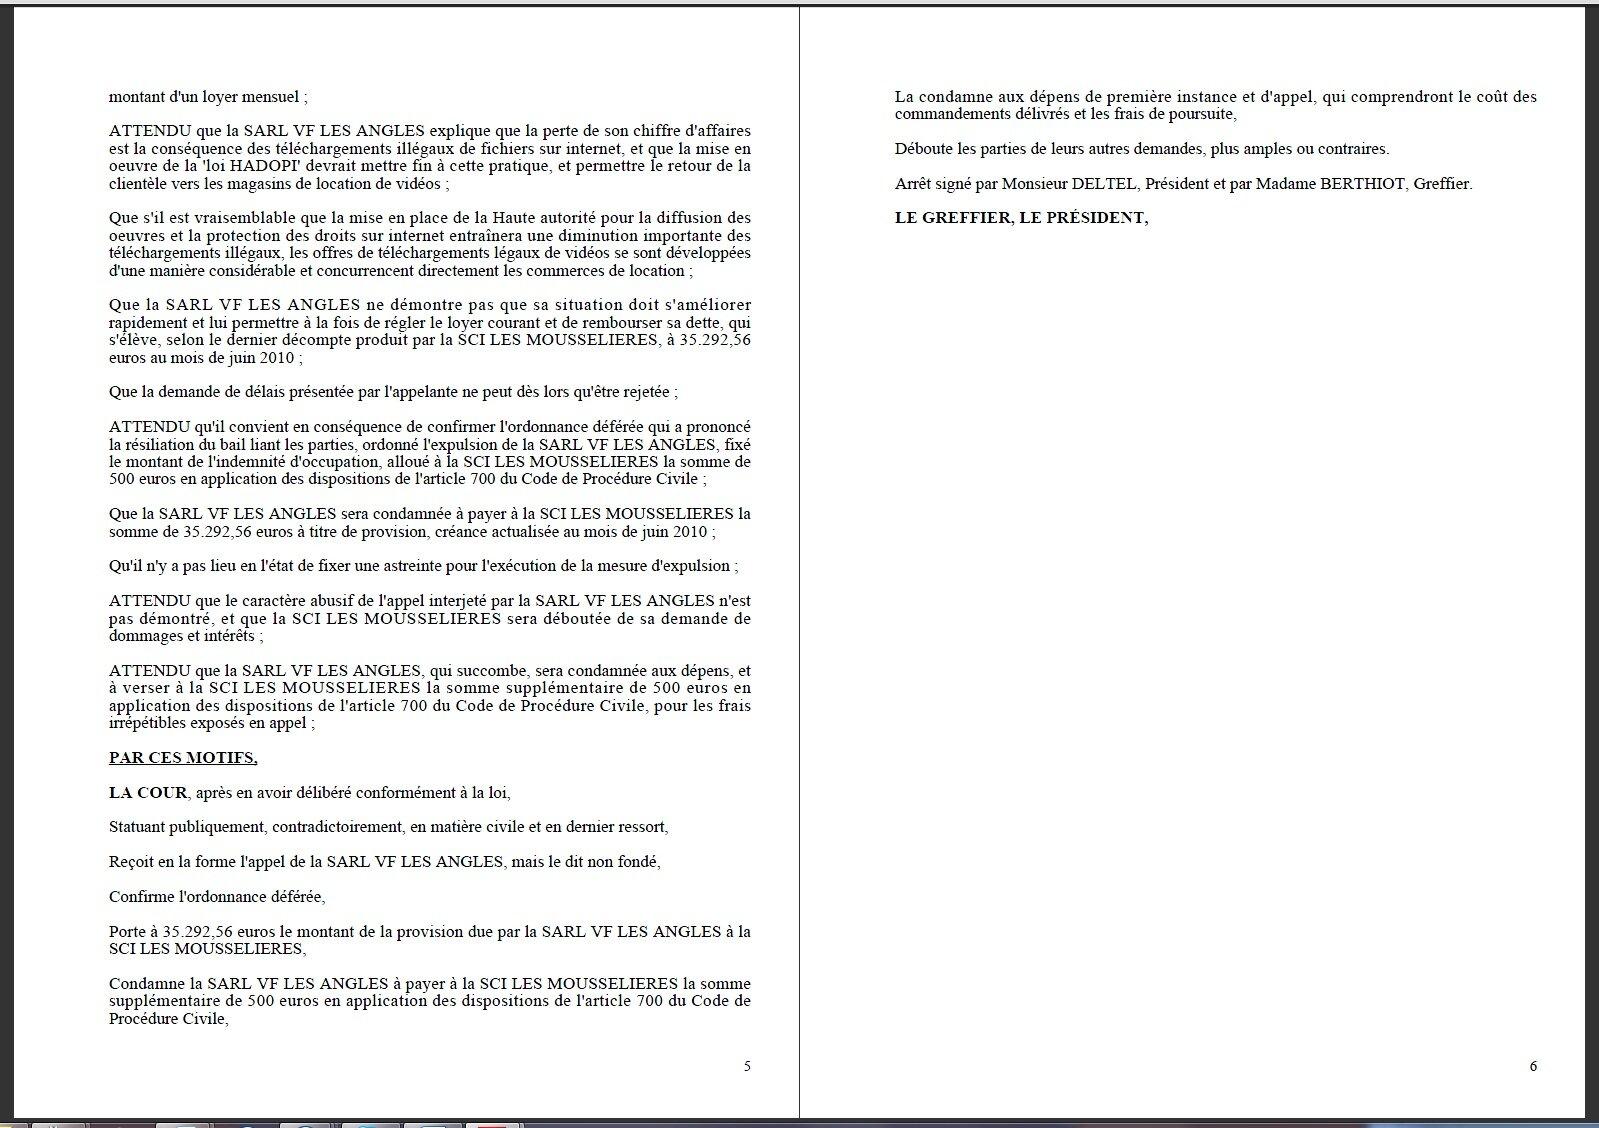 sle cover letter format for application pdf apple